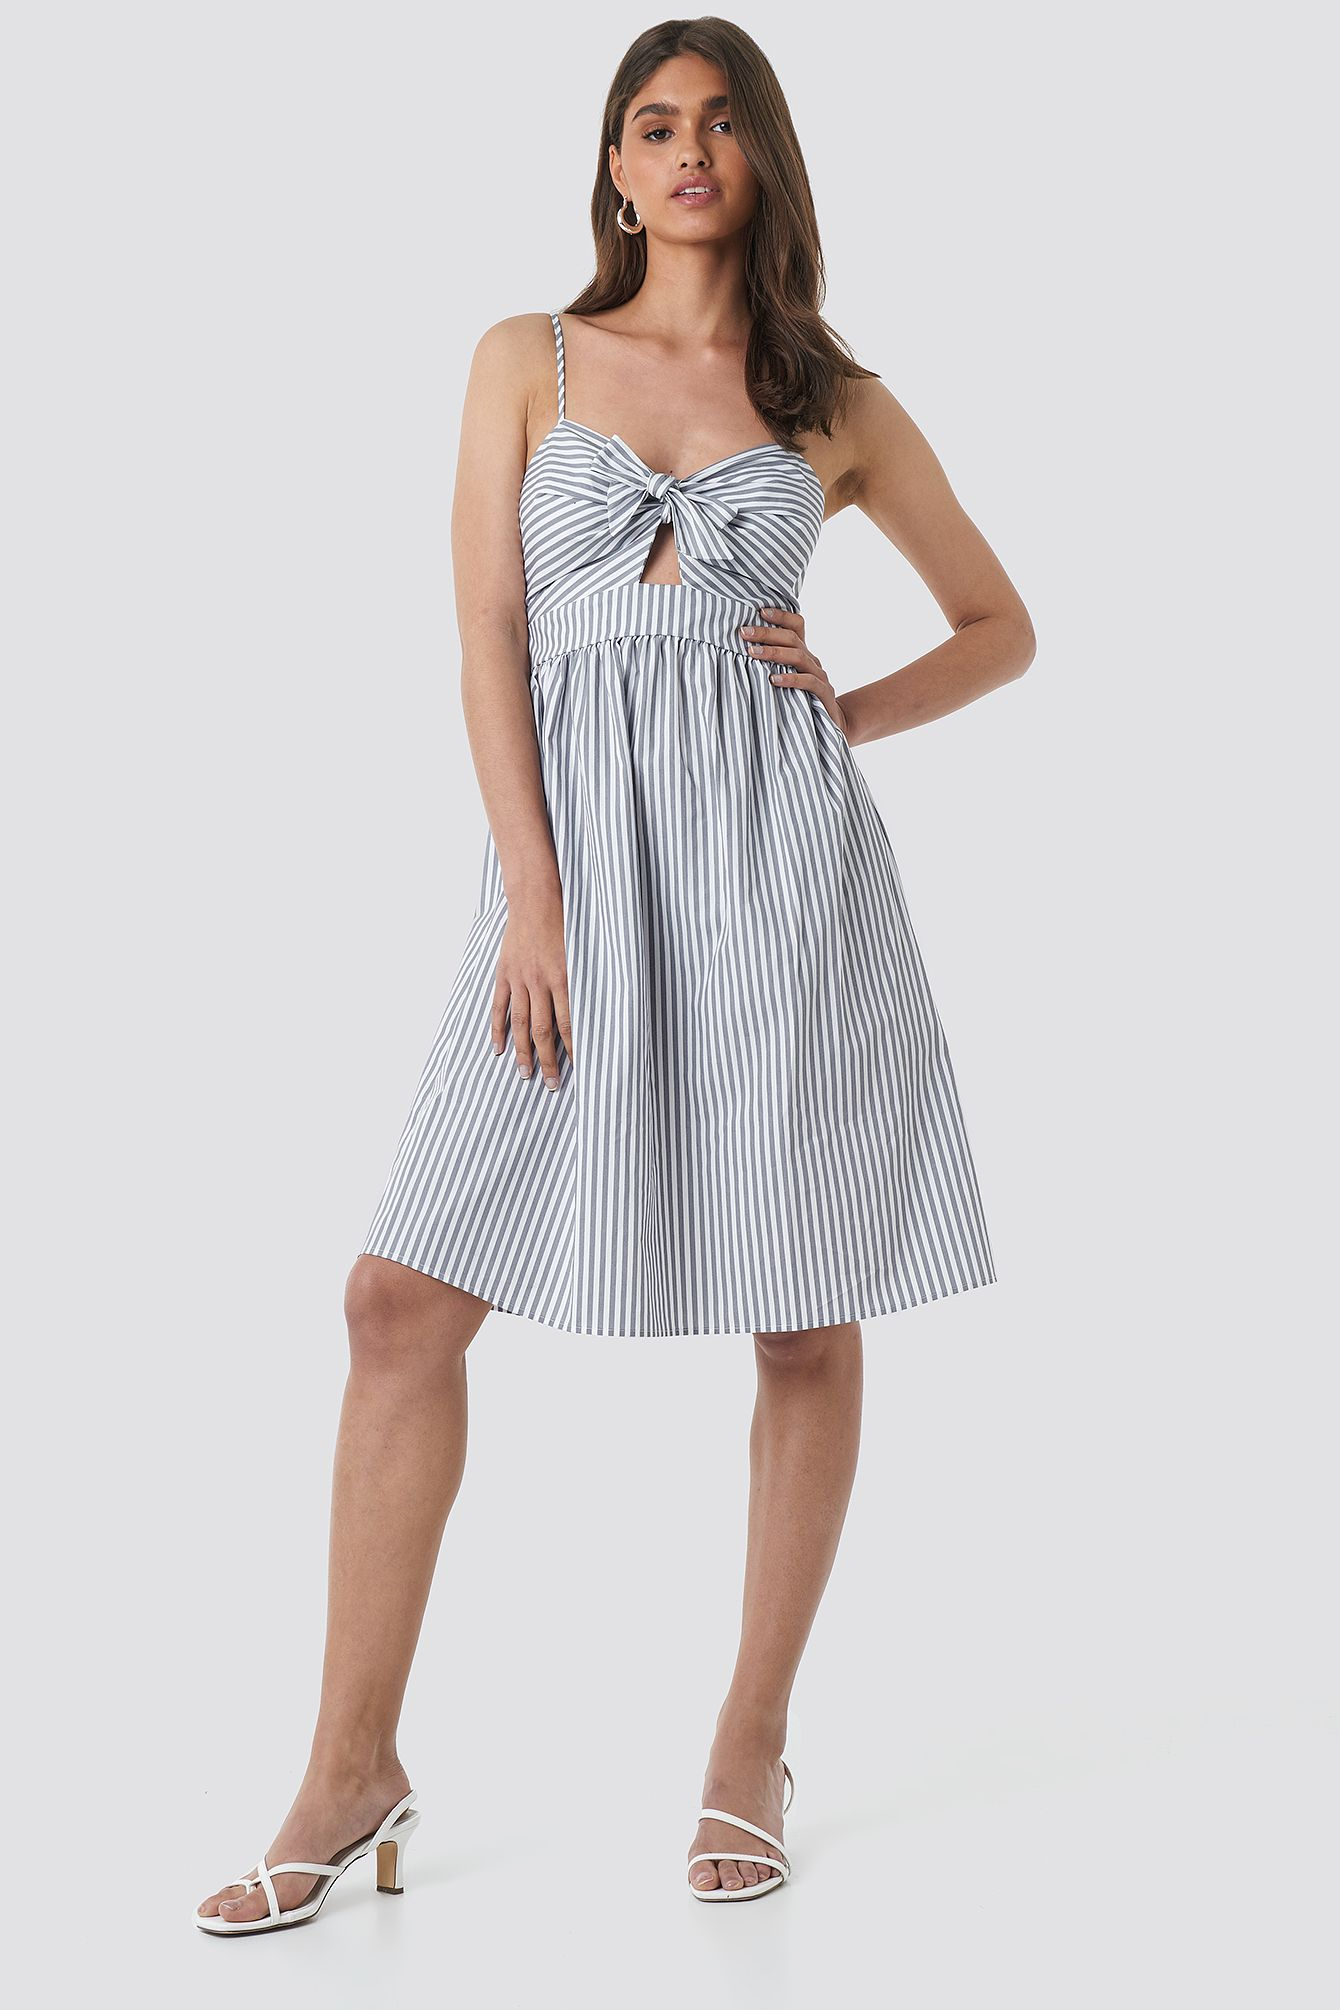 Front Knot Midi Dress in 2020 | Midikleider, Neues kleid ...